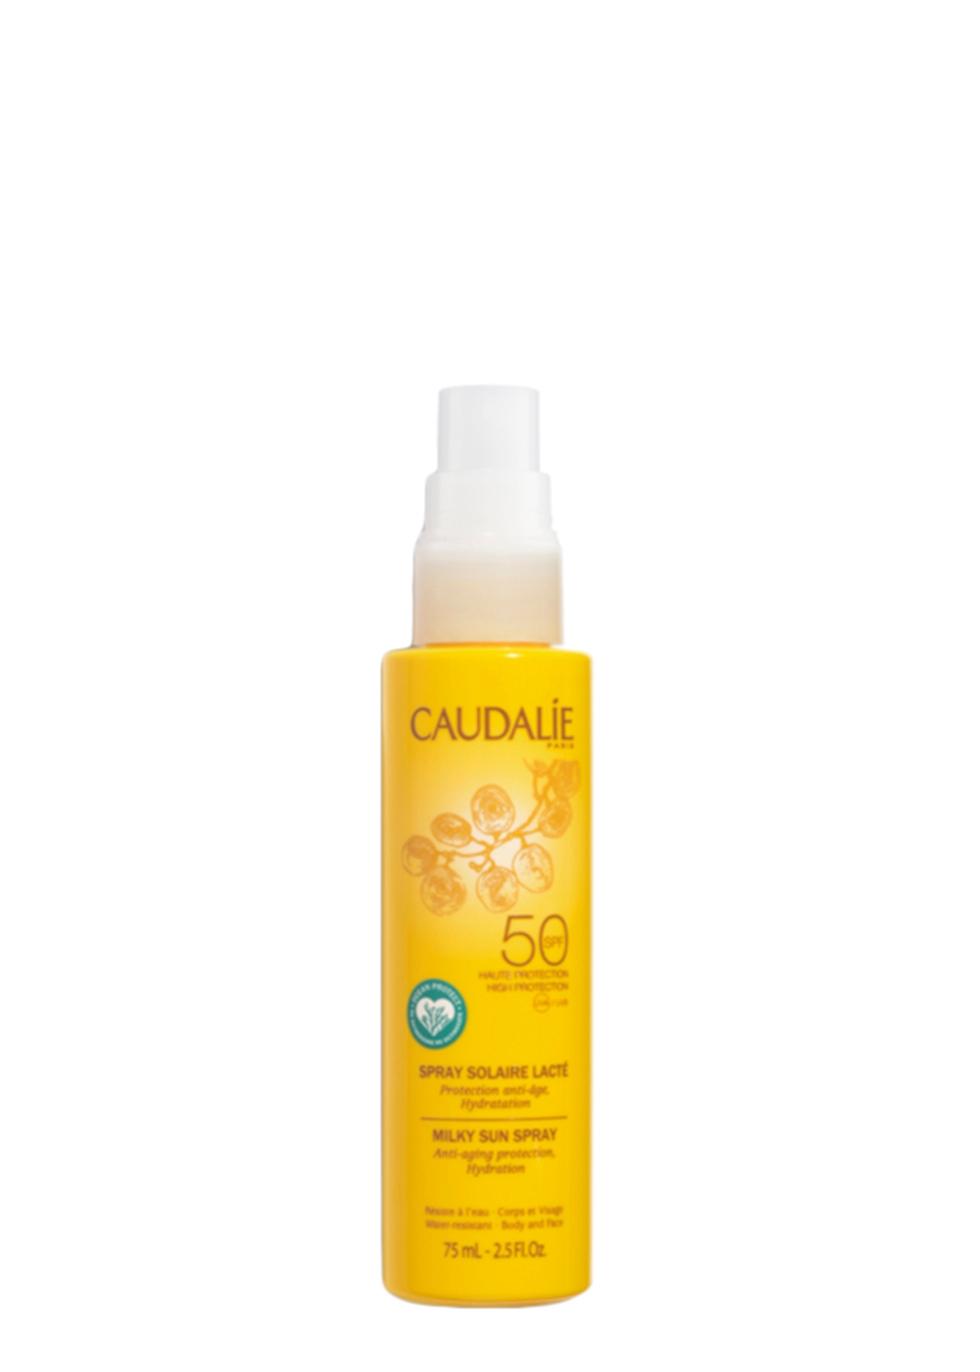 Milky Sun Spray SPF50 75ml